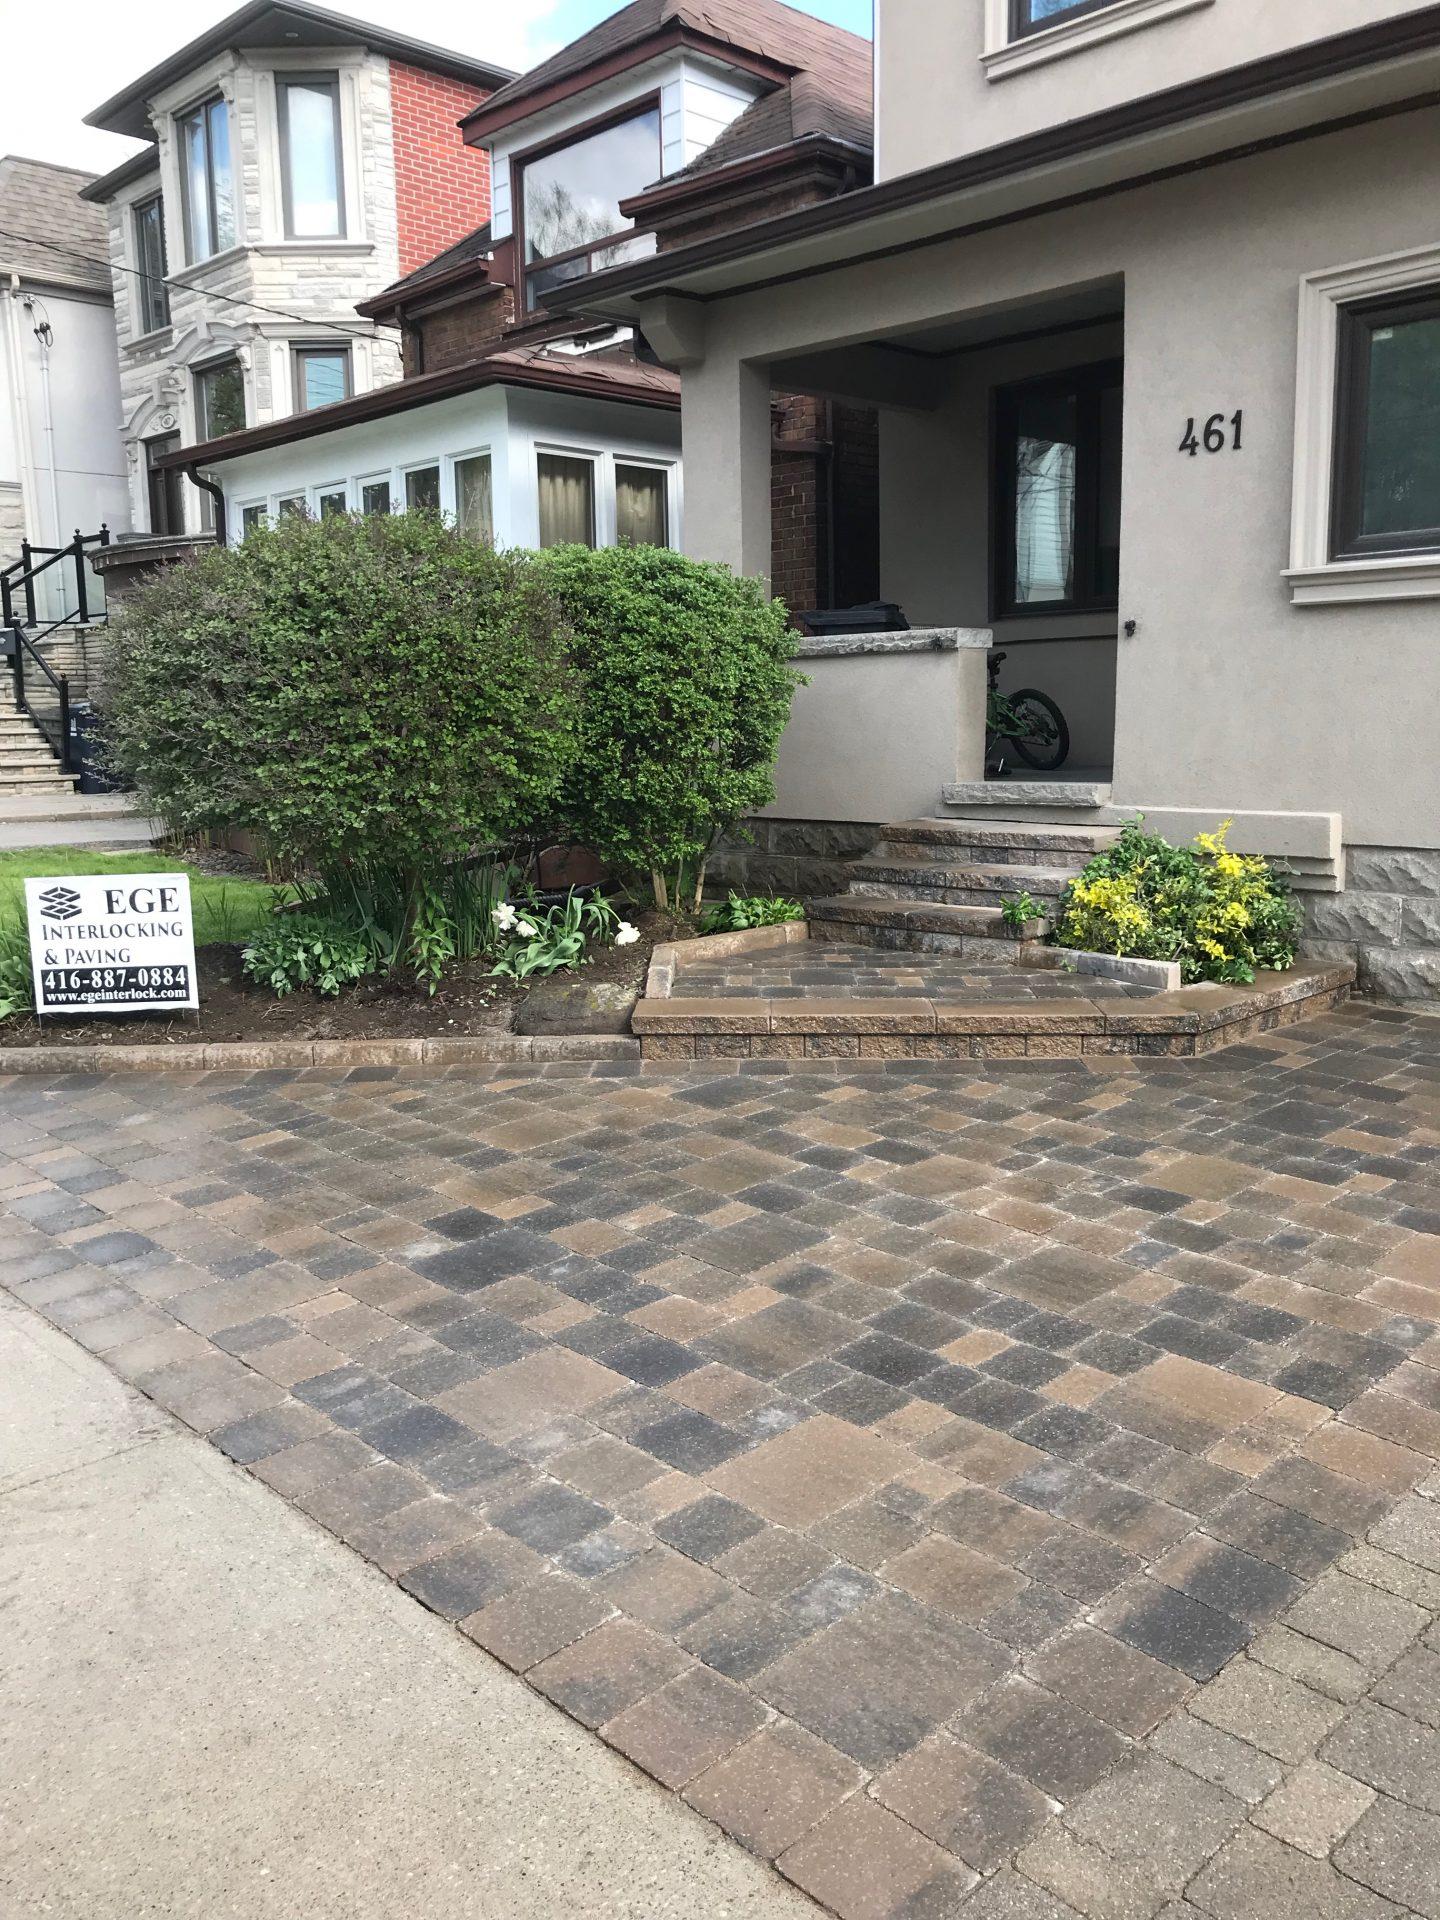 Interlock Driveway Repairs in Toronto